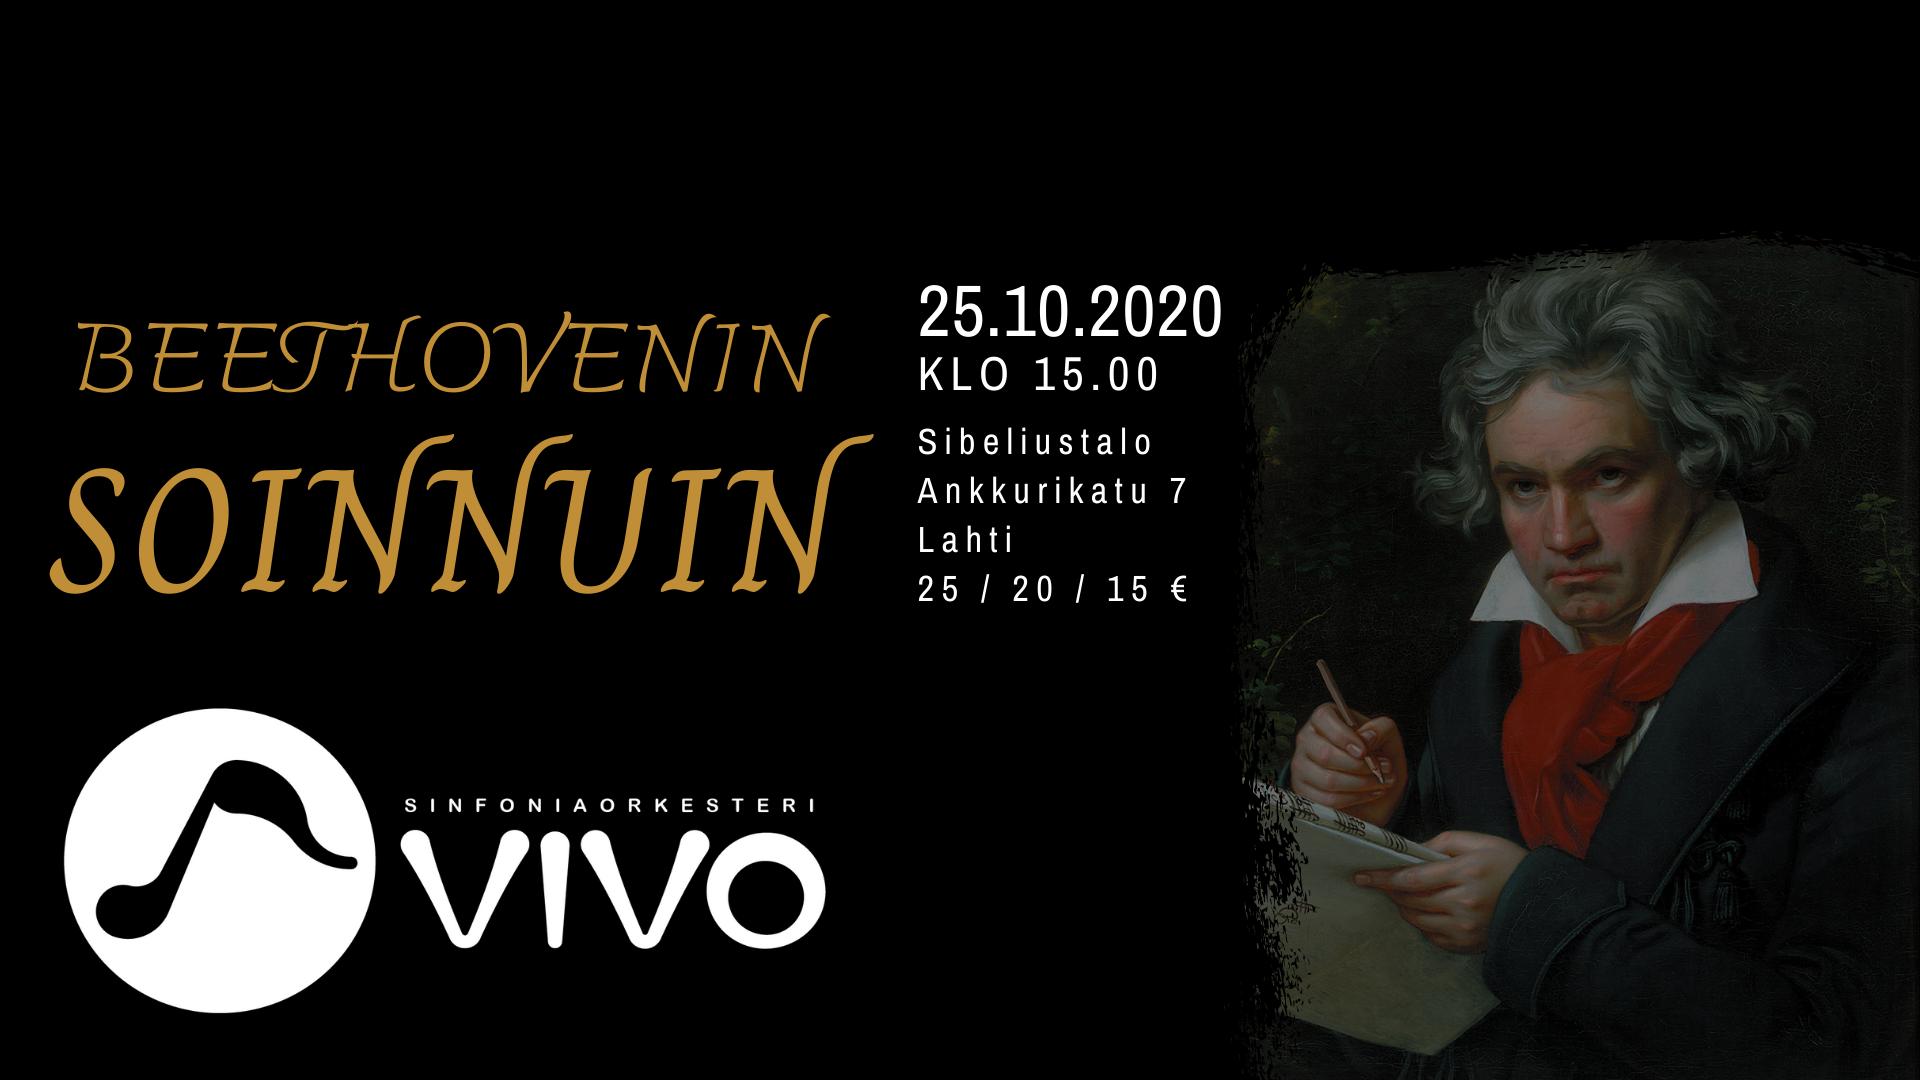 You are currently viewing MENNYTTÄ: Beethovenin soinnuin